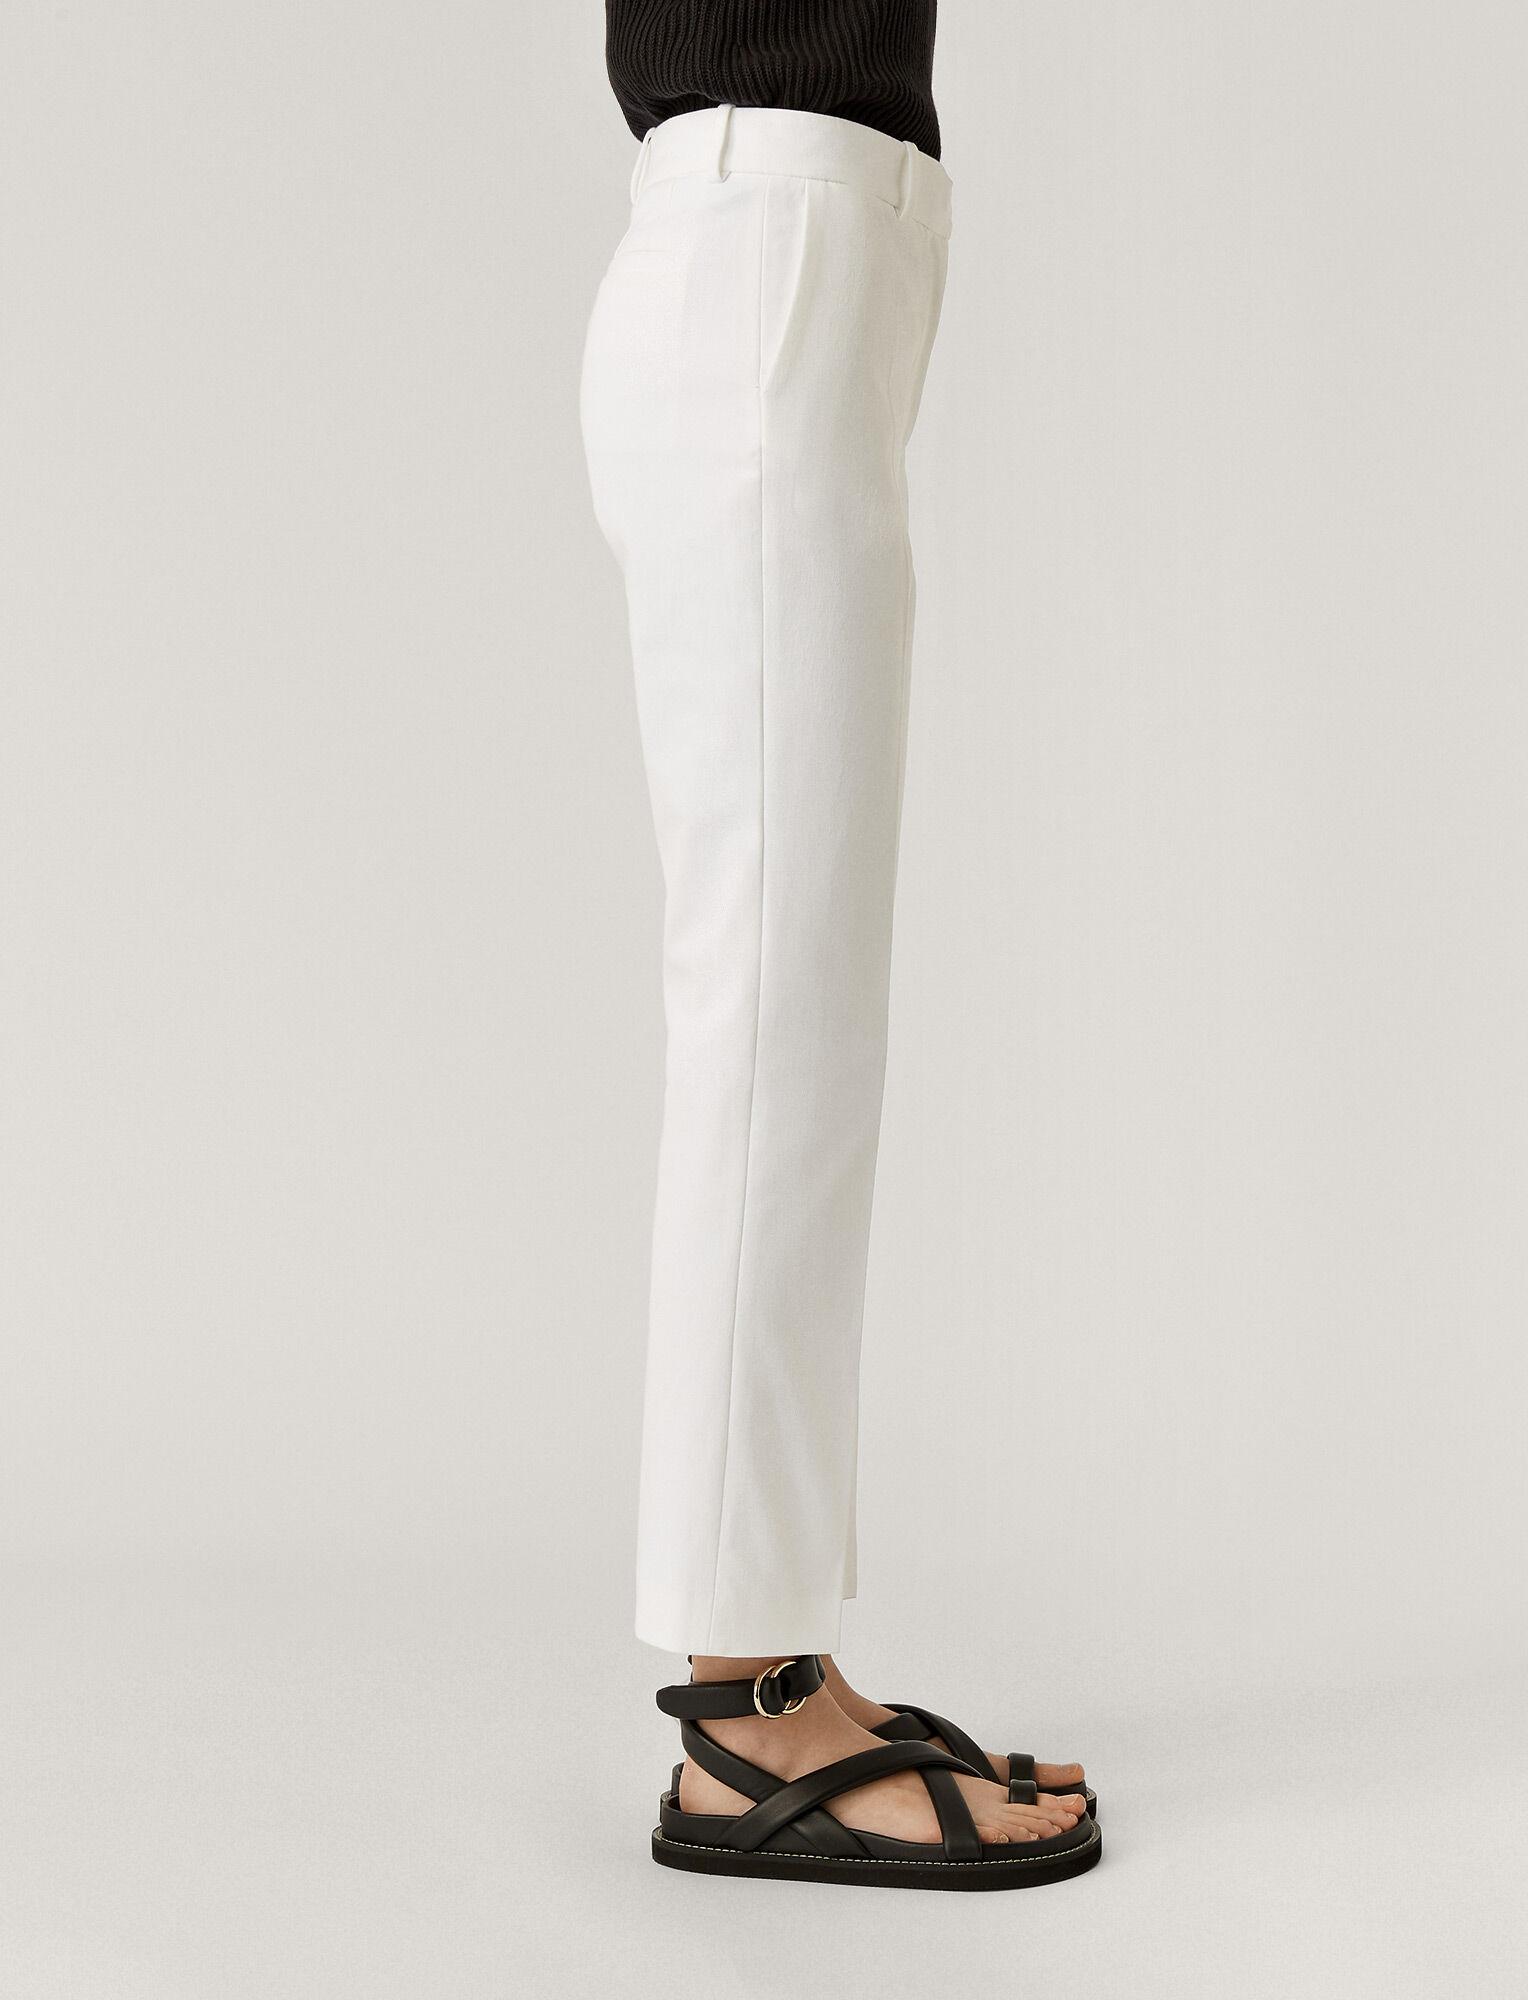 Joseph, Coleman Gabardine Stretch Trousers, in WHITE